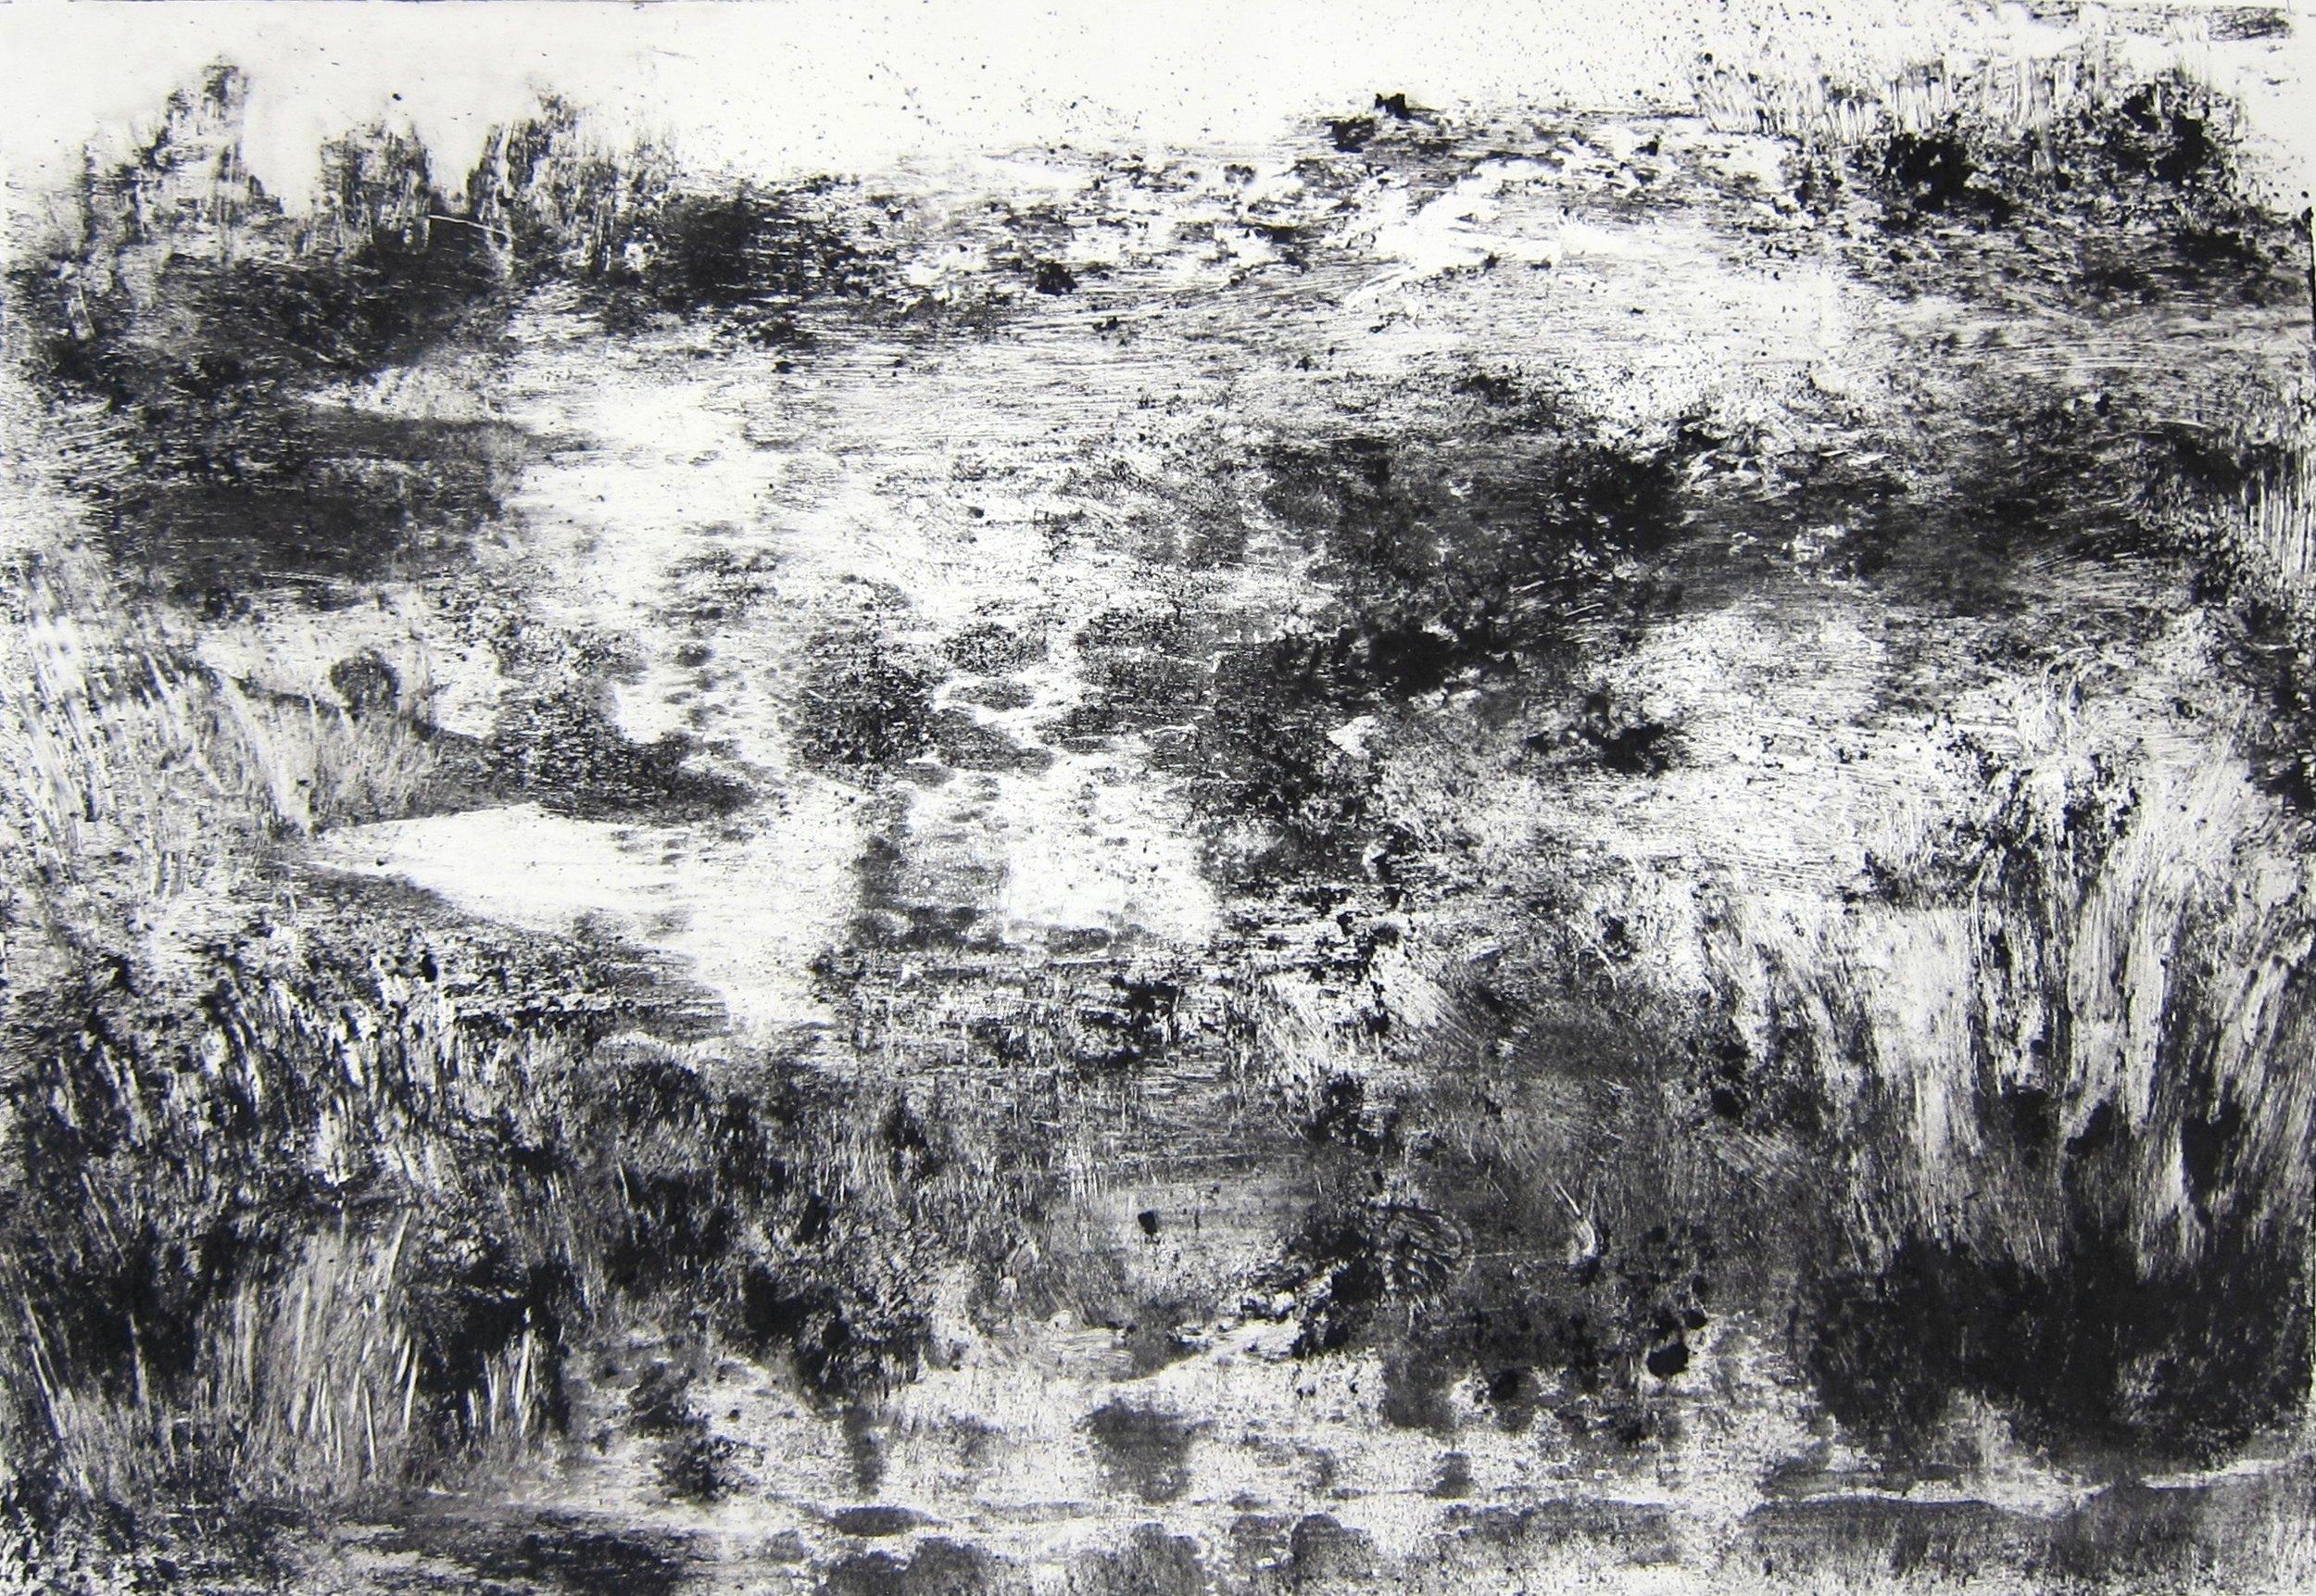 Dunes II  charcoal and cold wax on terraskin  40 x 32 cm  £295